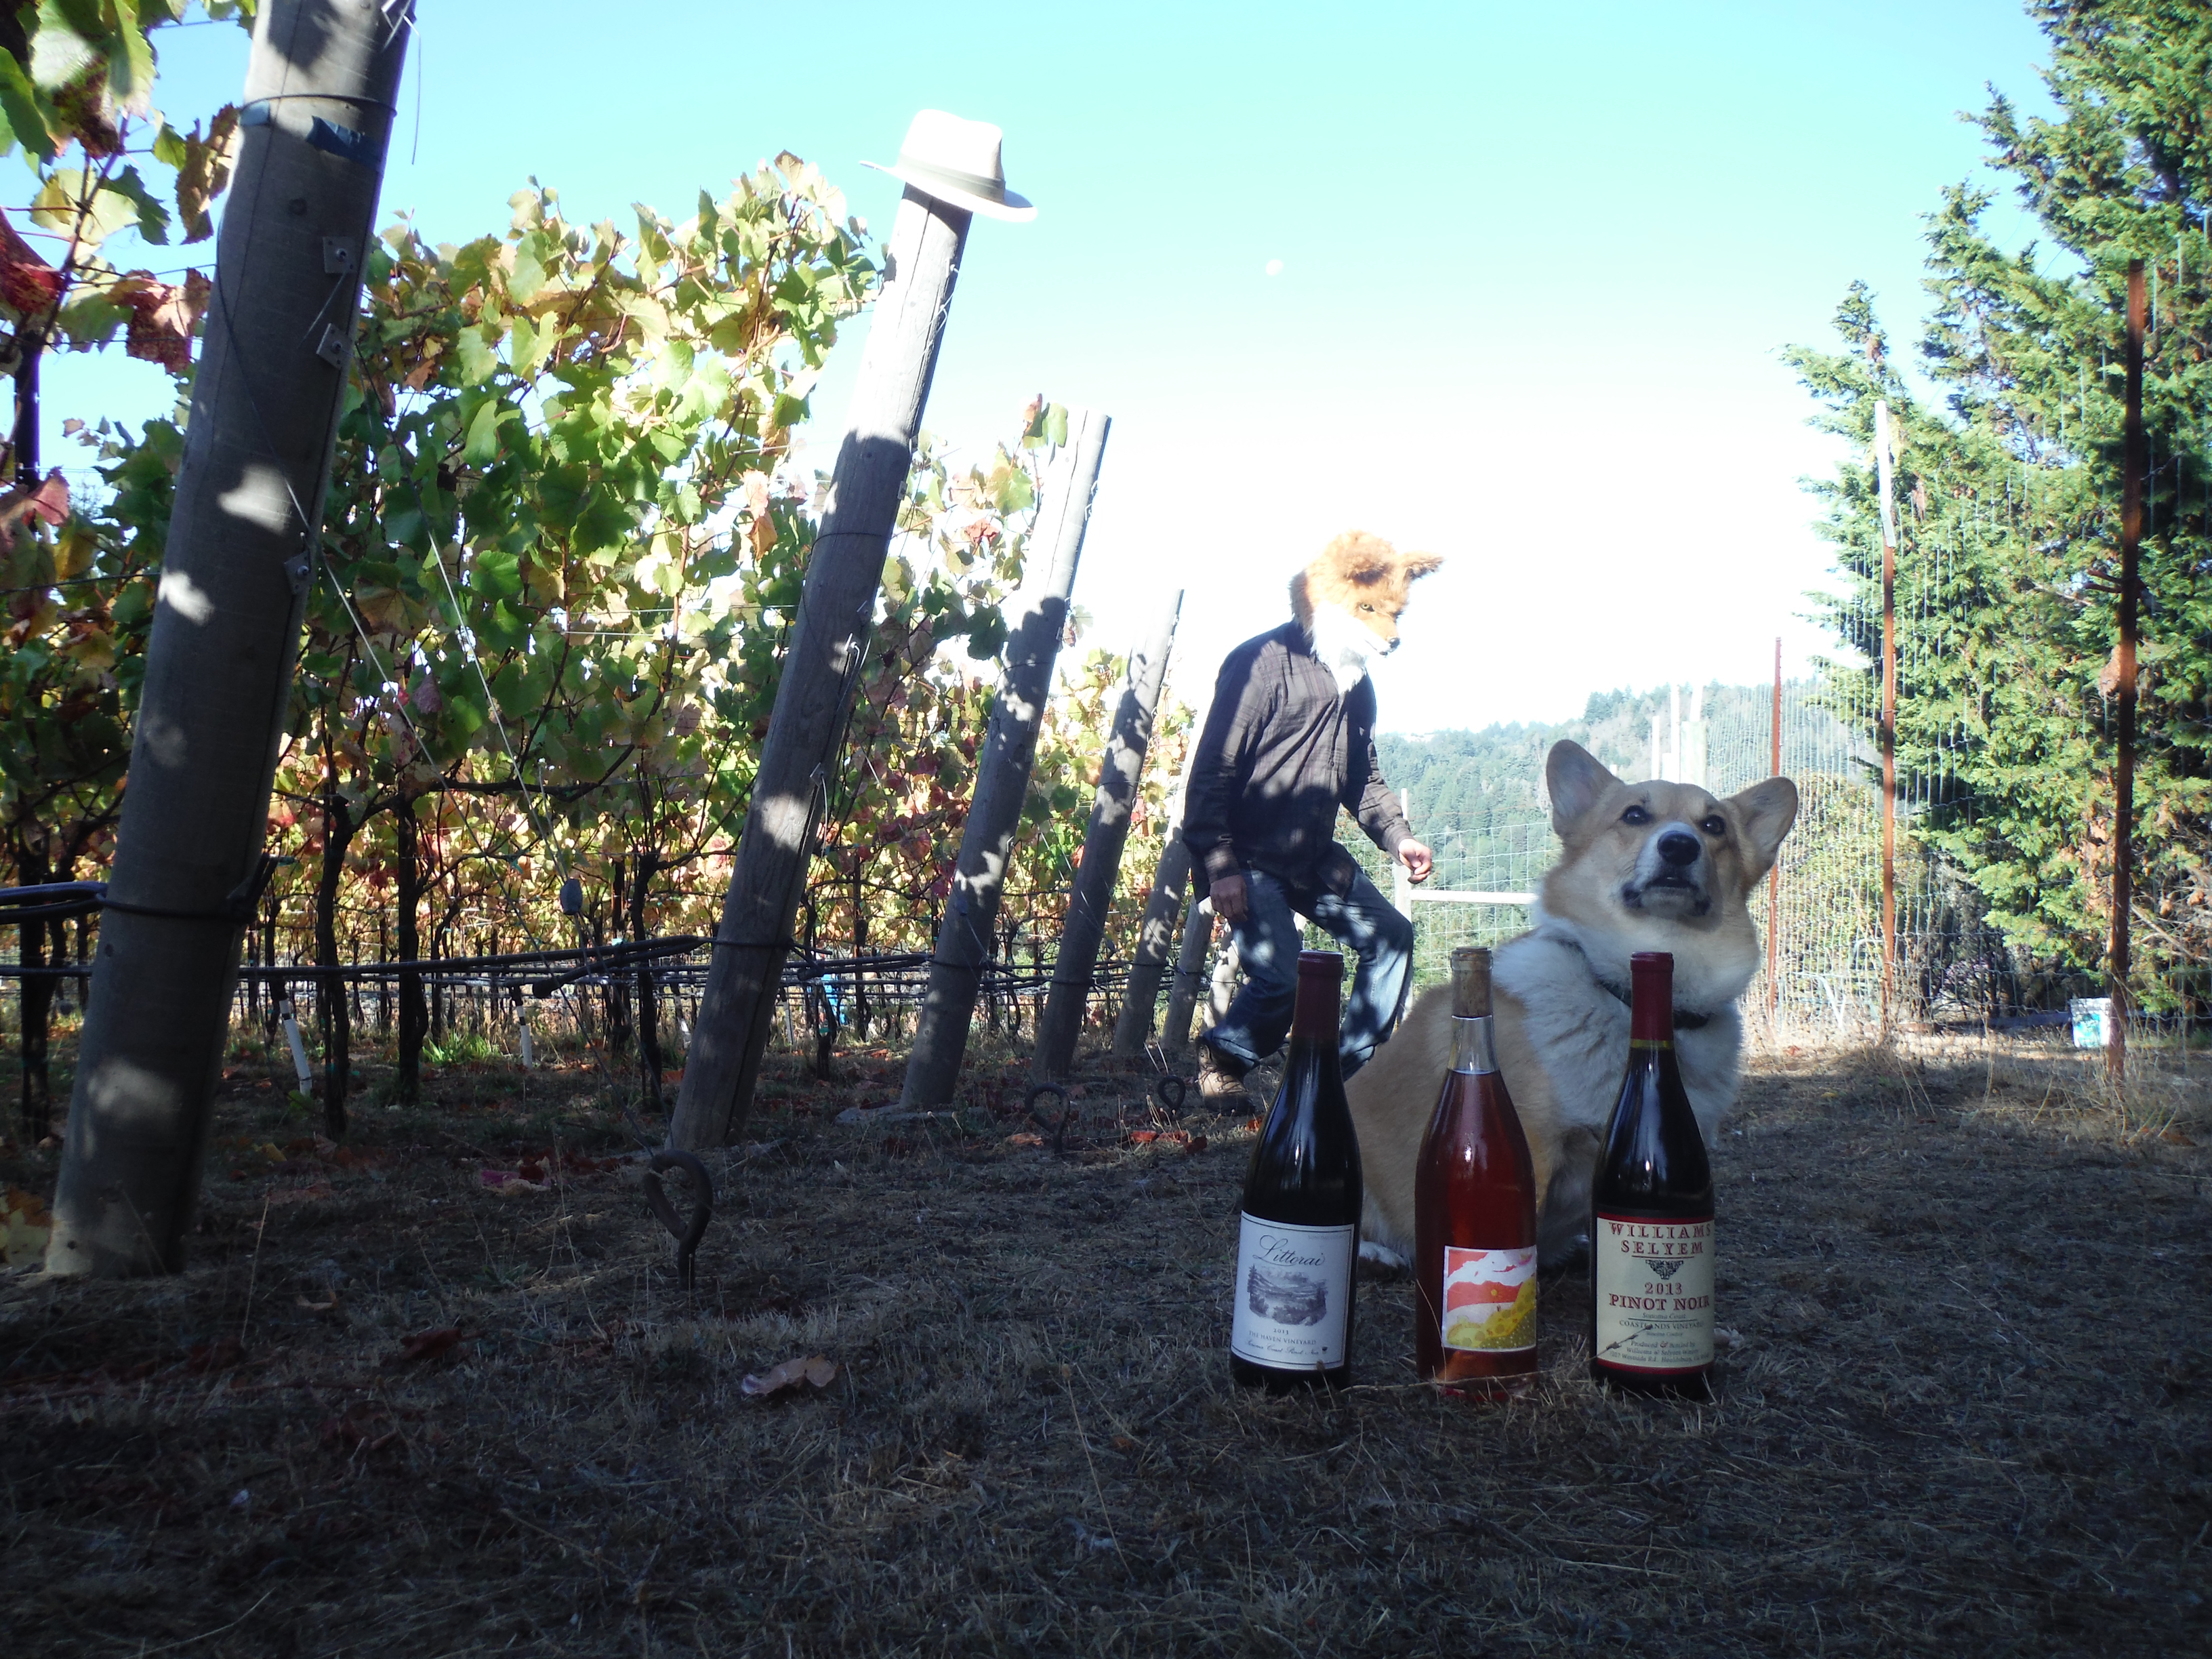 2019 wine harvest